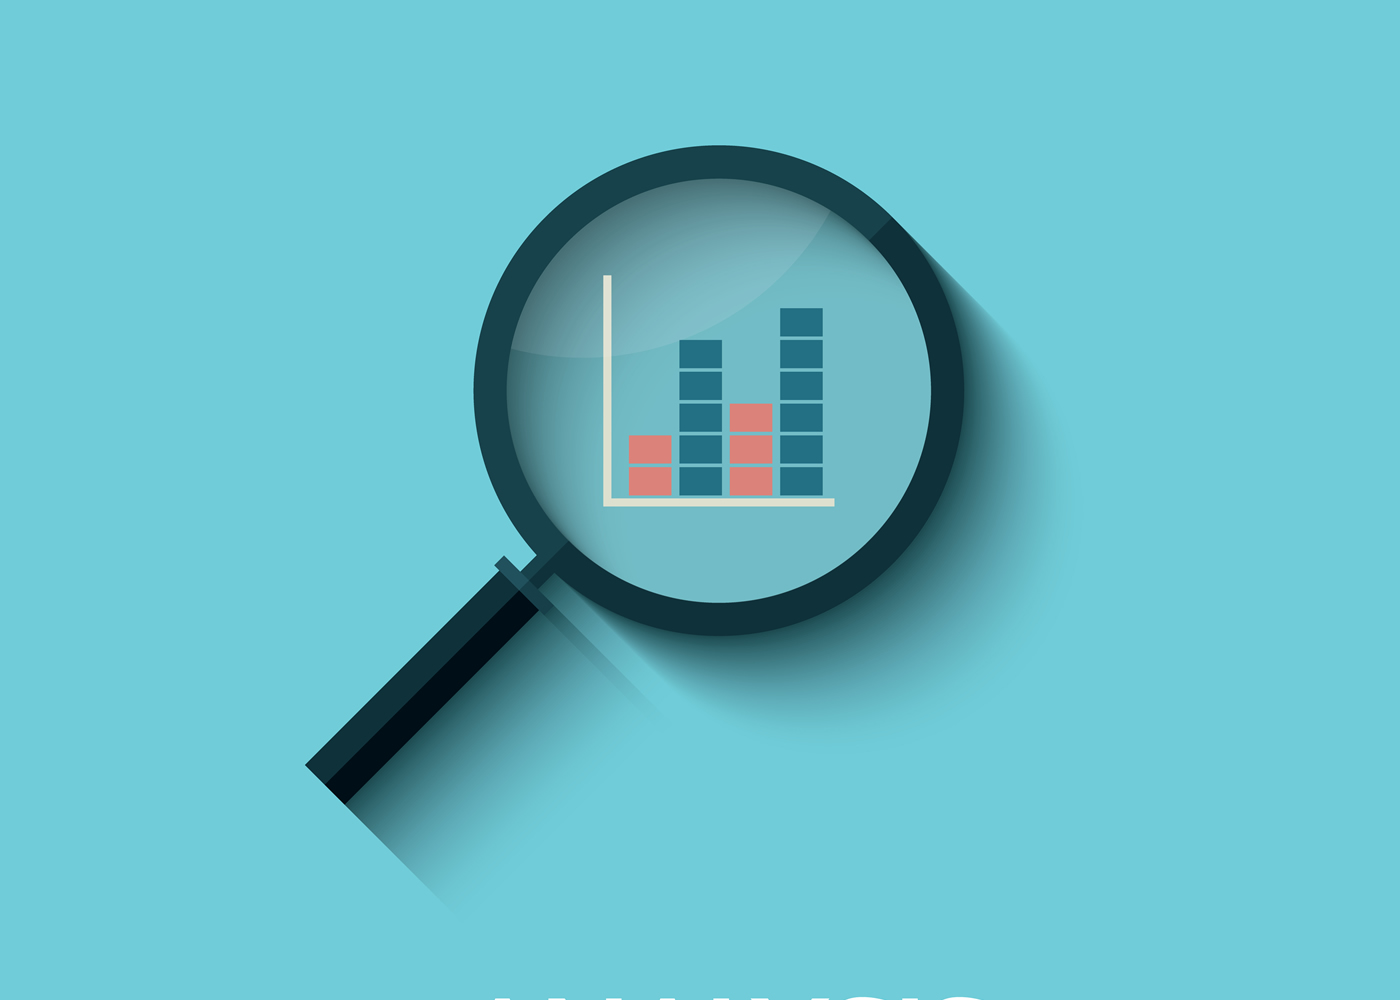 naem-research-quickpolls-2015-12-incident-investigation-tools-700x500